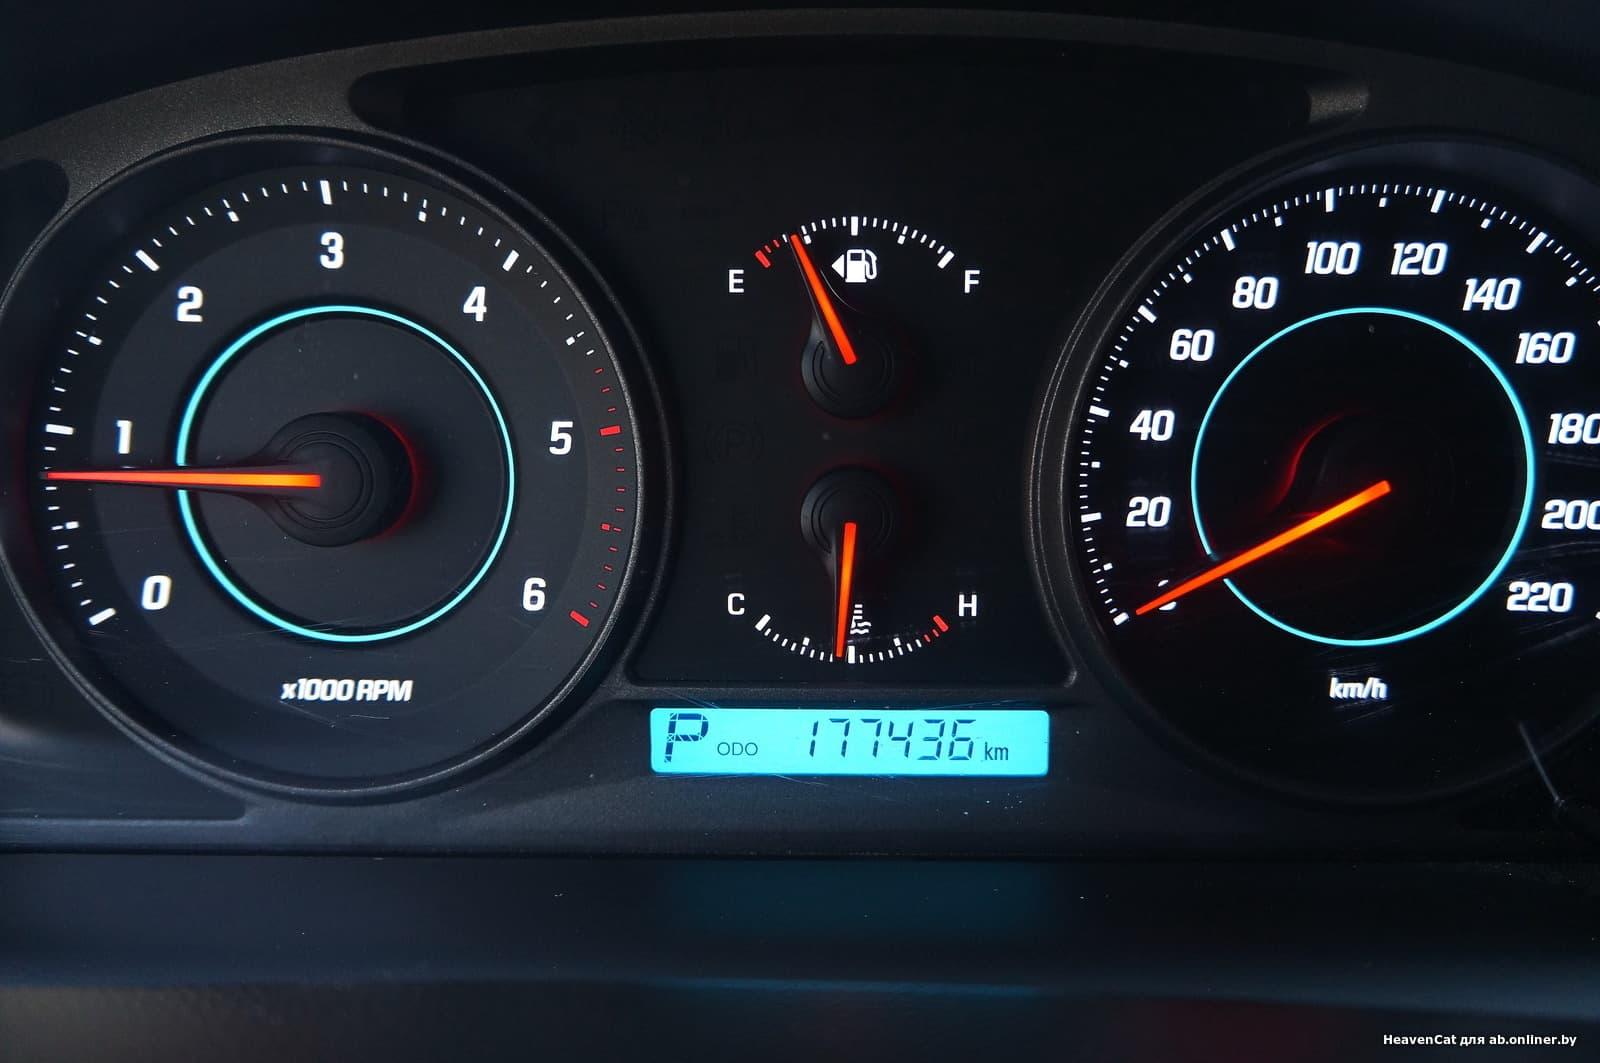 Chevrolet Captiva LX 4x4